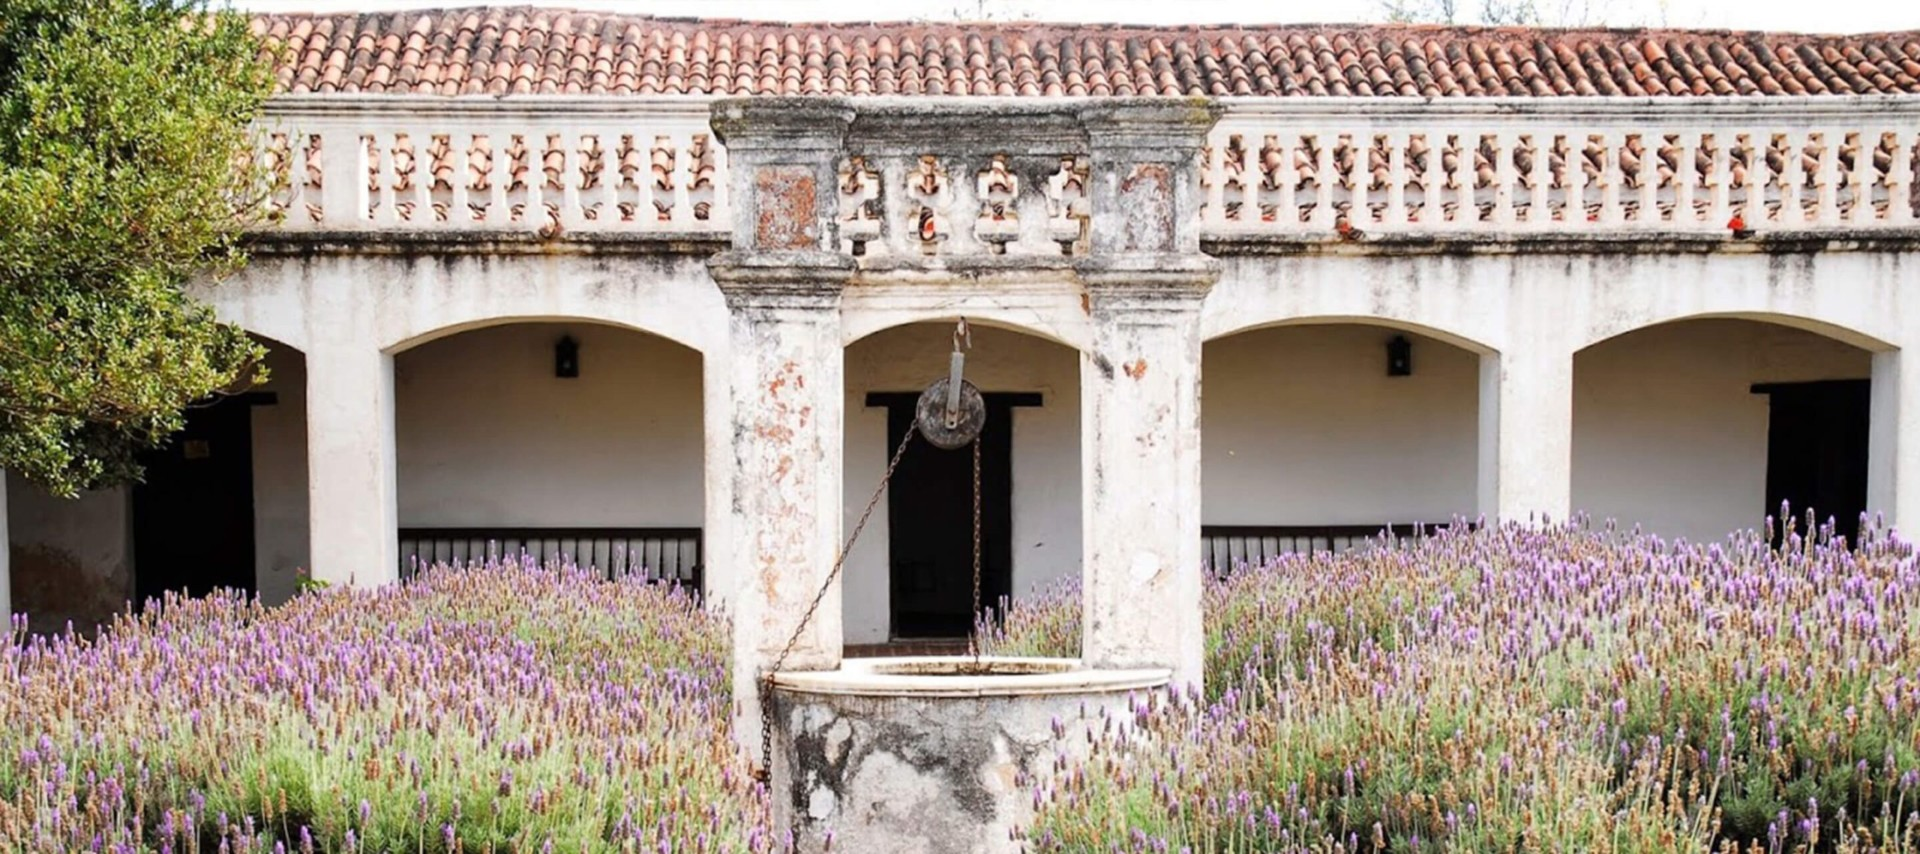 Old well in Cordoba